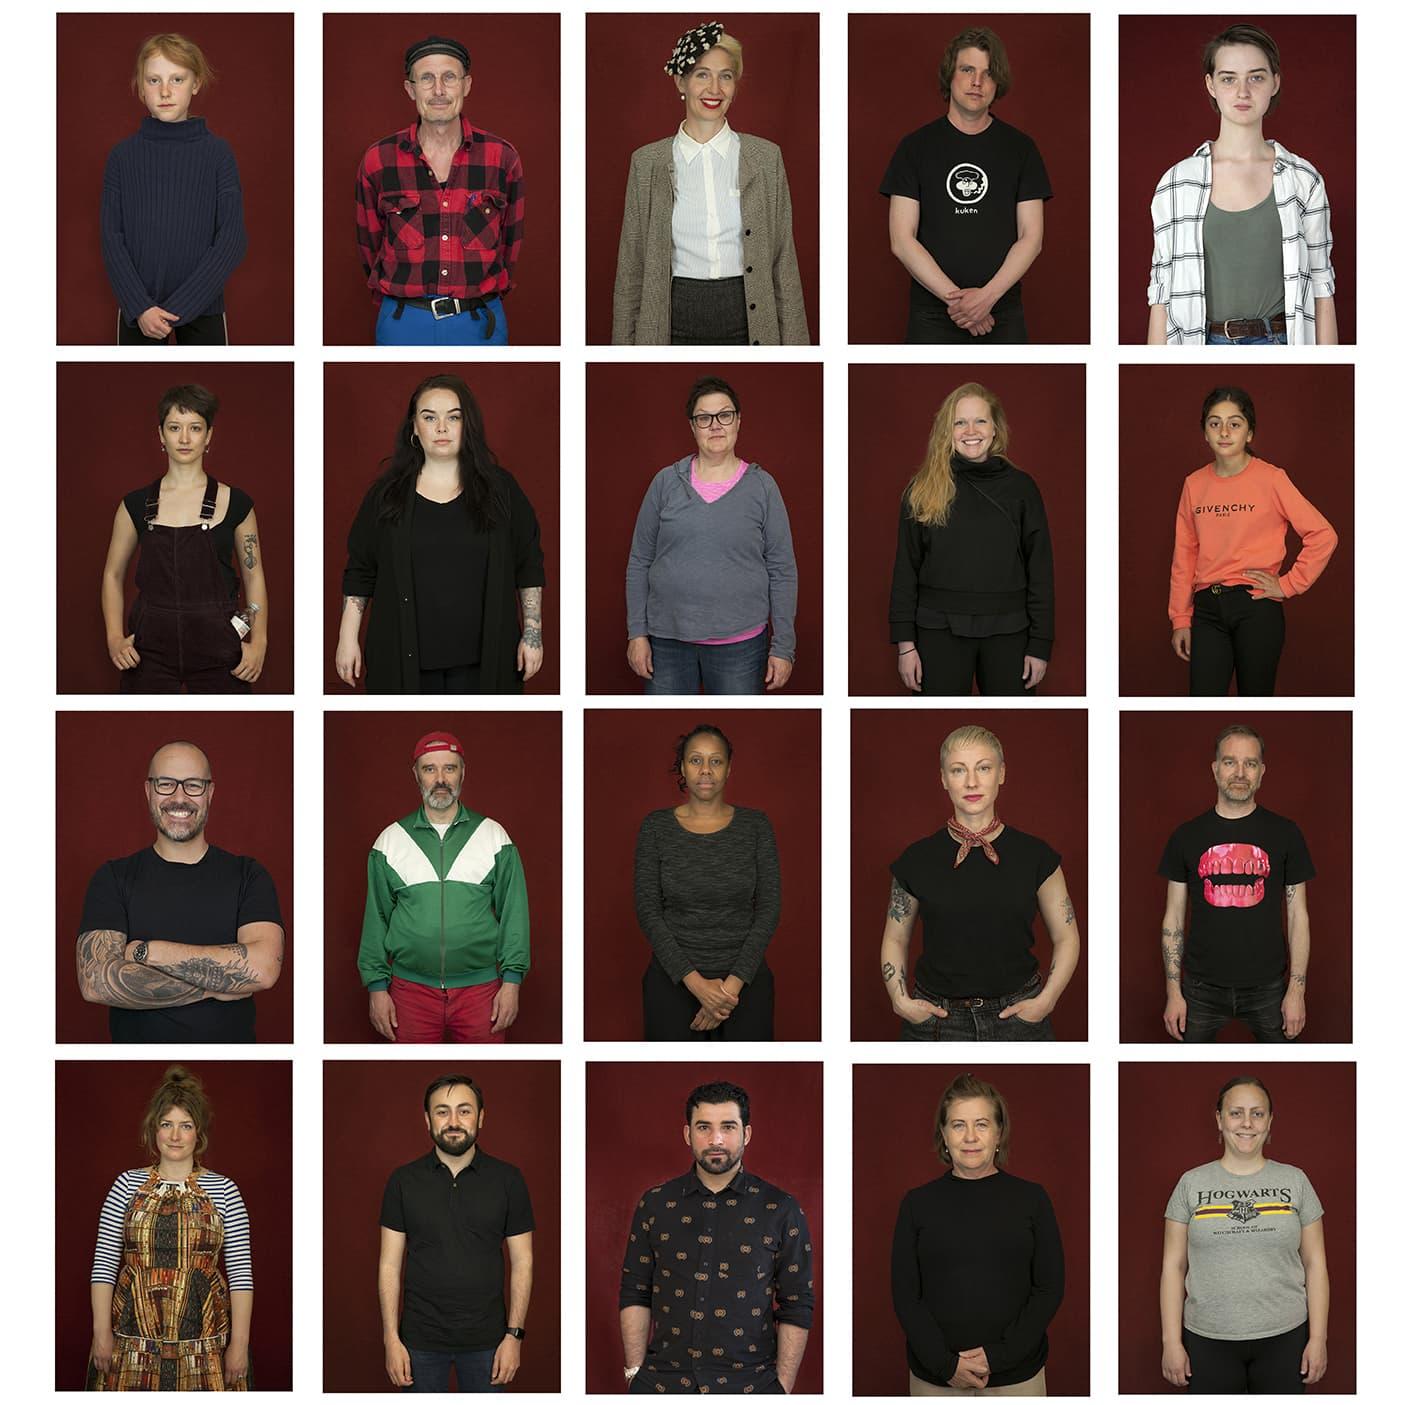 Stockholms stjarnor collage s